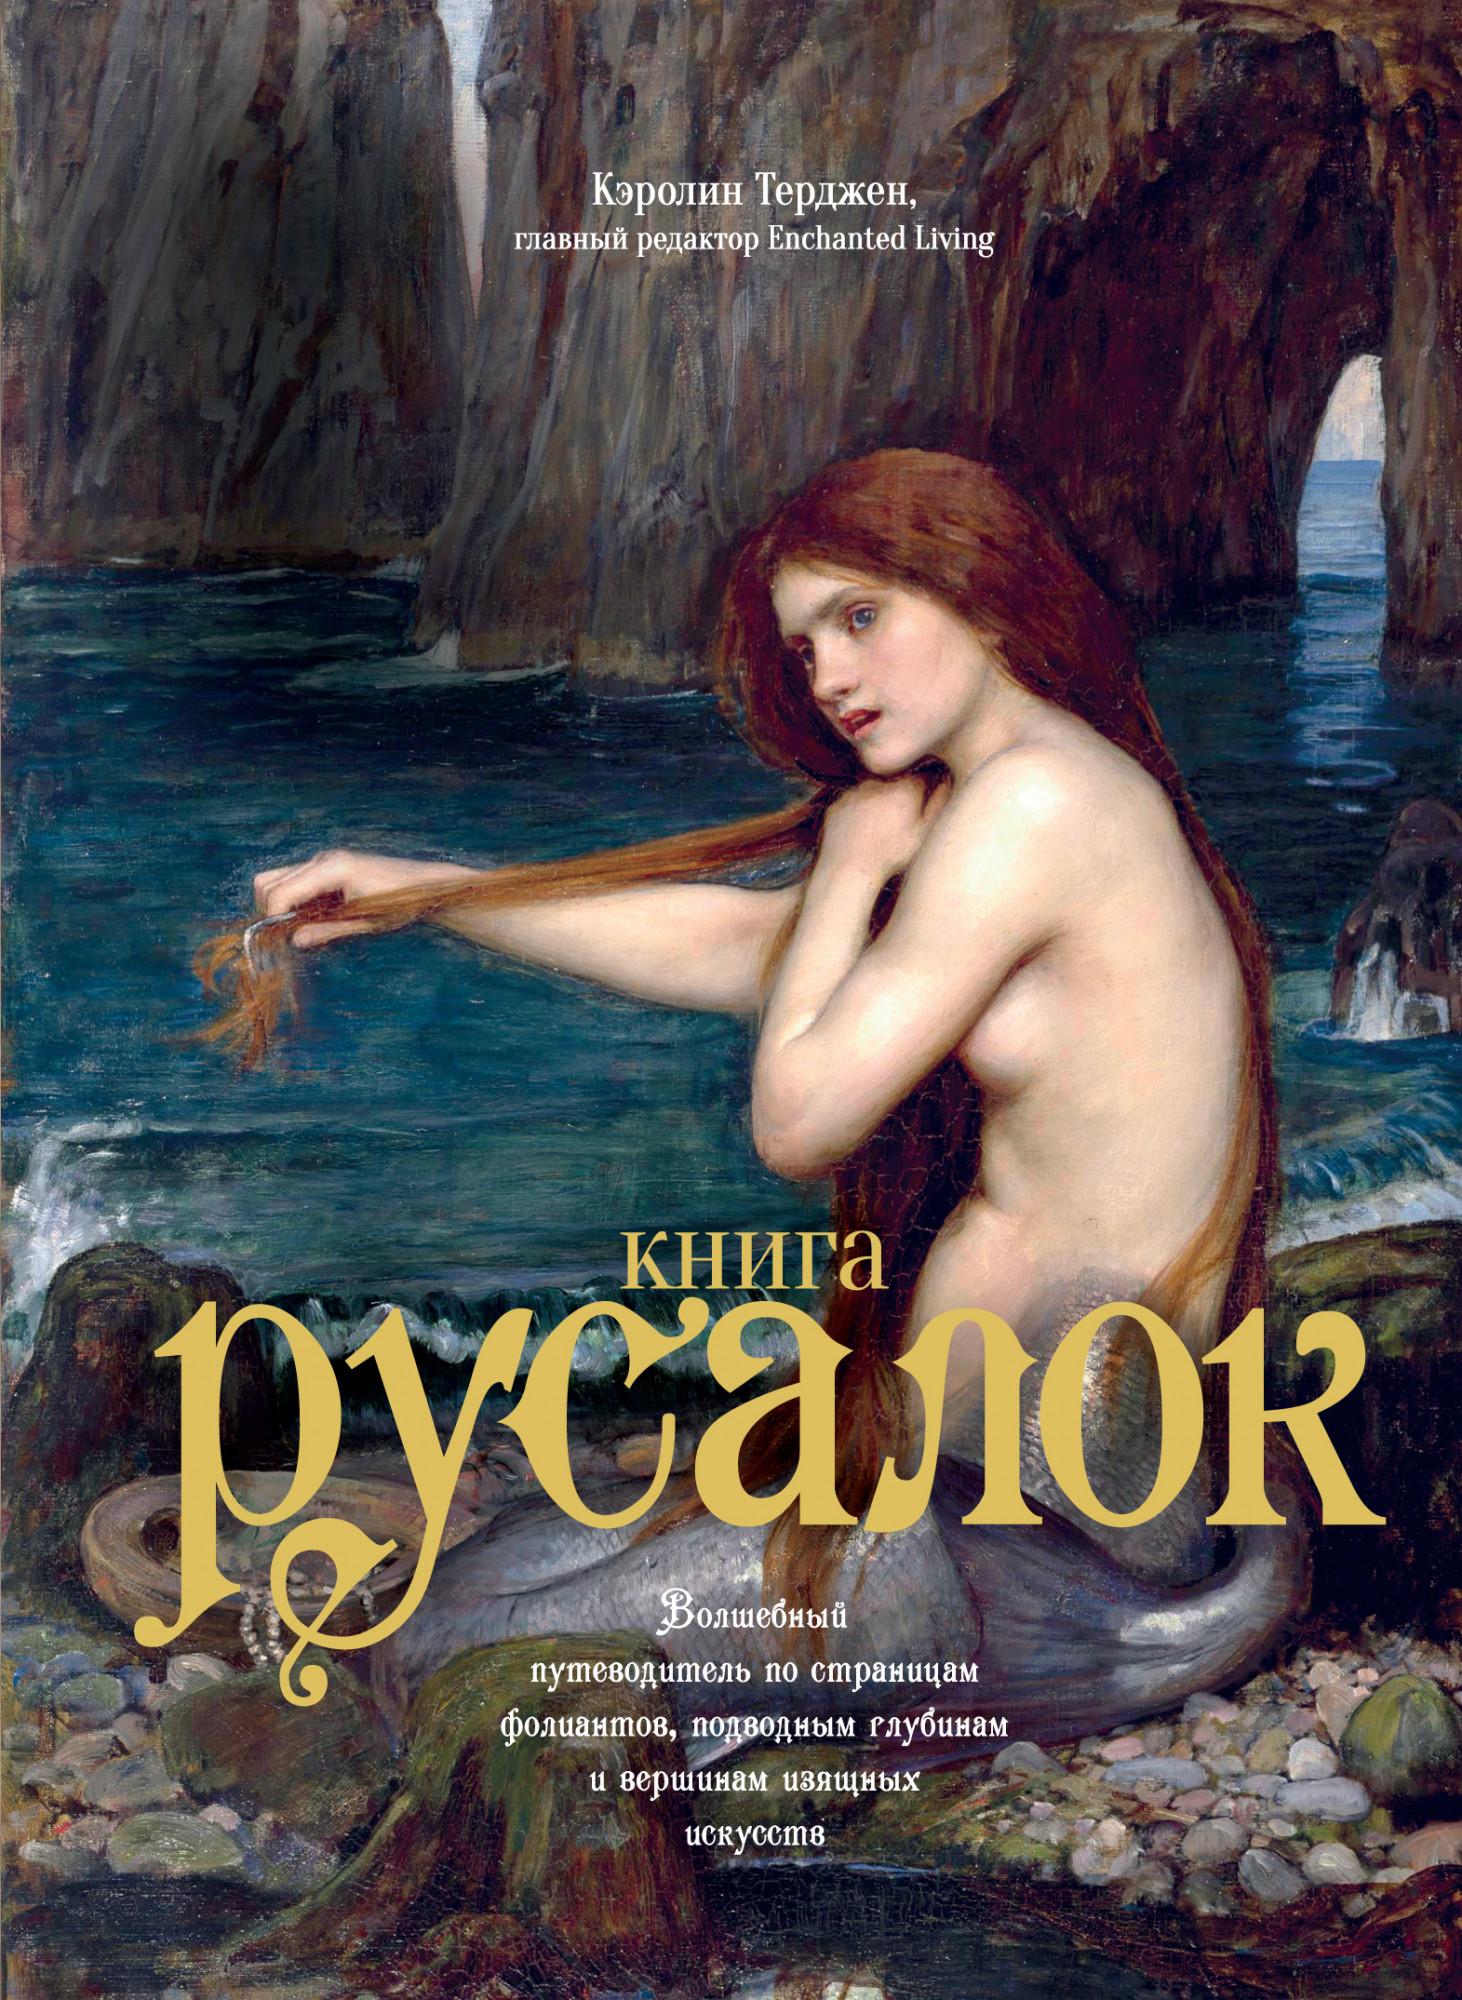 Тревор Кокс Книга Русалок: Волшебный путеводитель